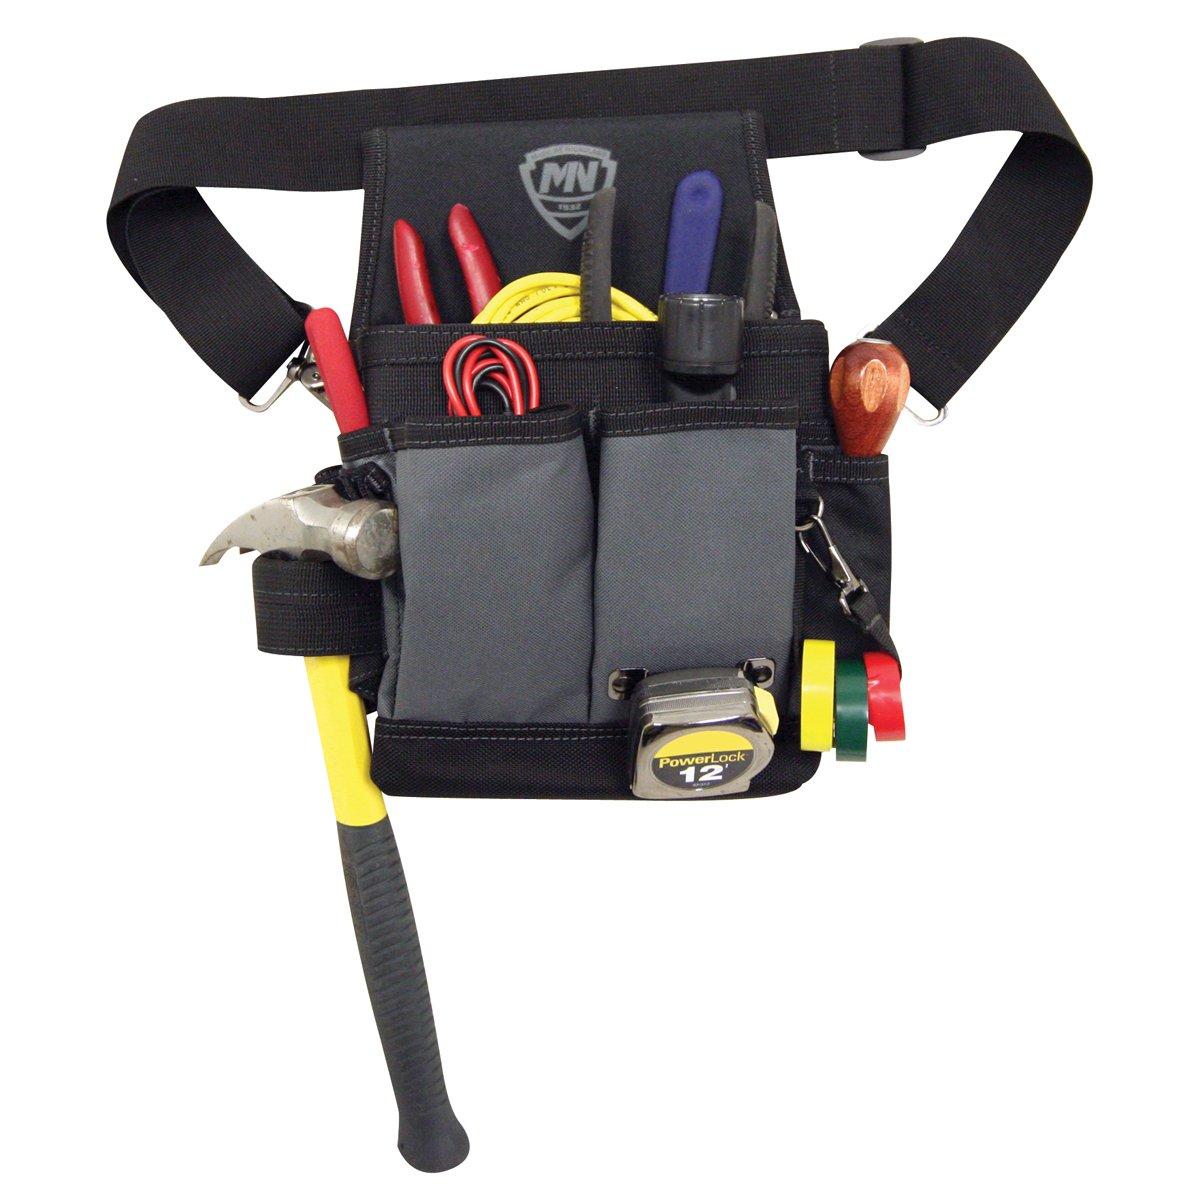 McGuire-Nicholas 30520-P Electrician's Work Pouch With Shoulder Strap